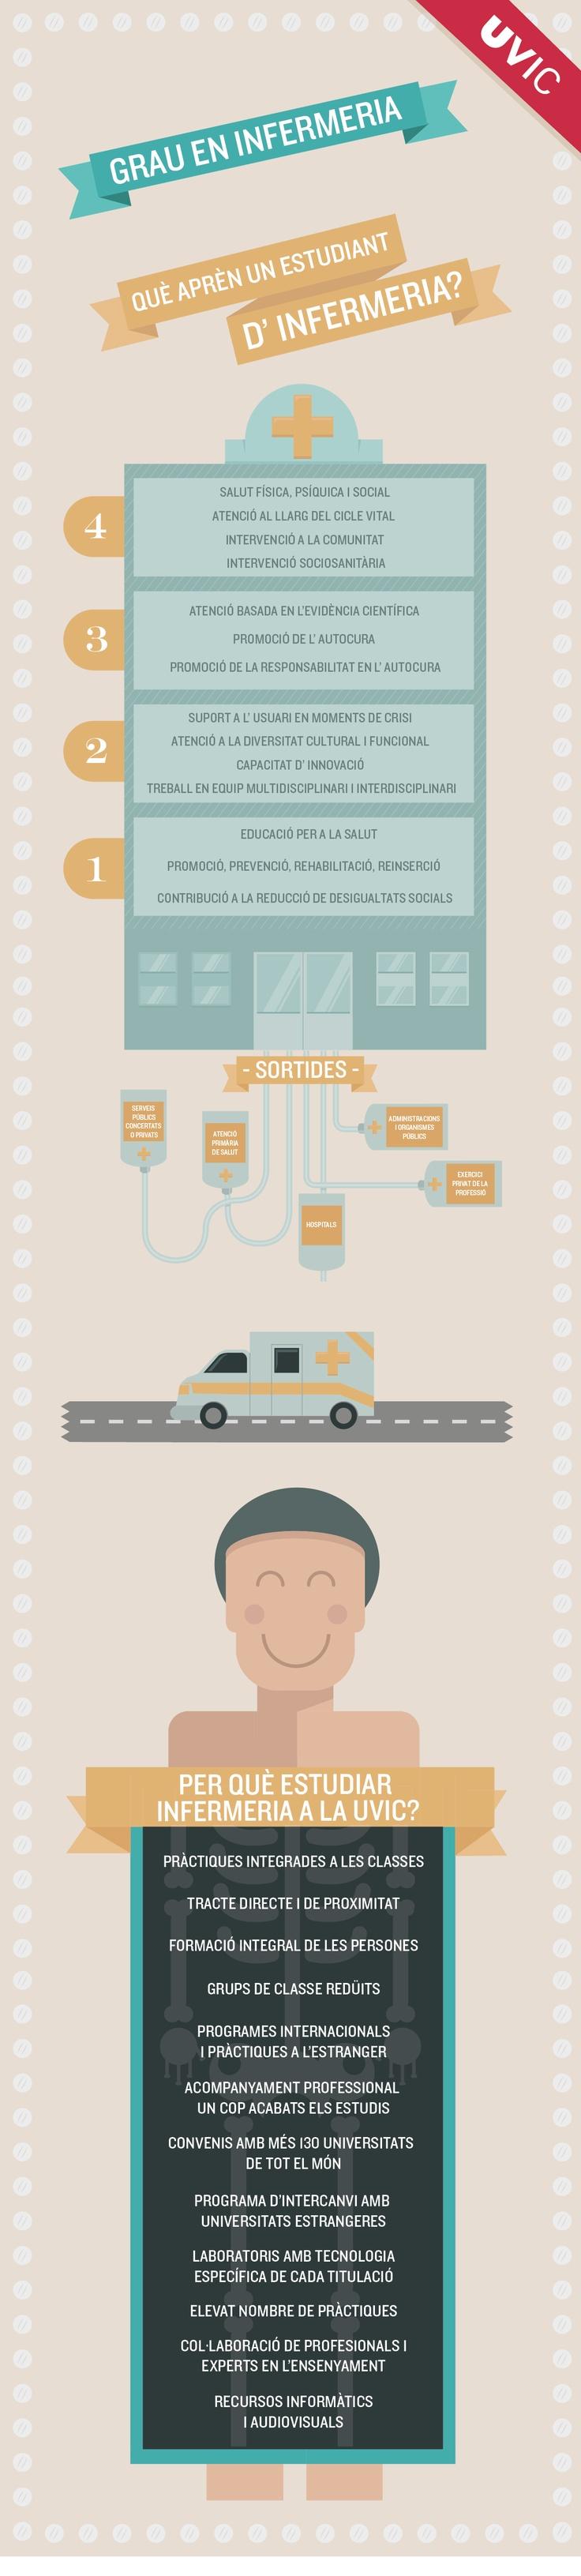 Infografia del Grau en Infermeria. #UVic #Infografia #infografies #Infermeria #grau #graus